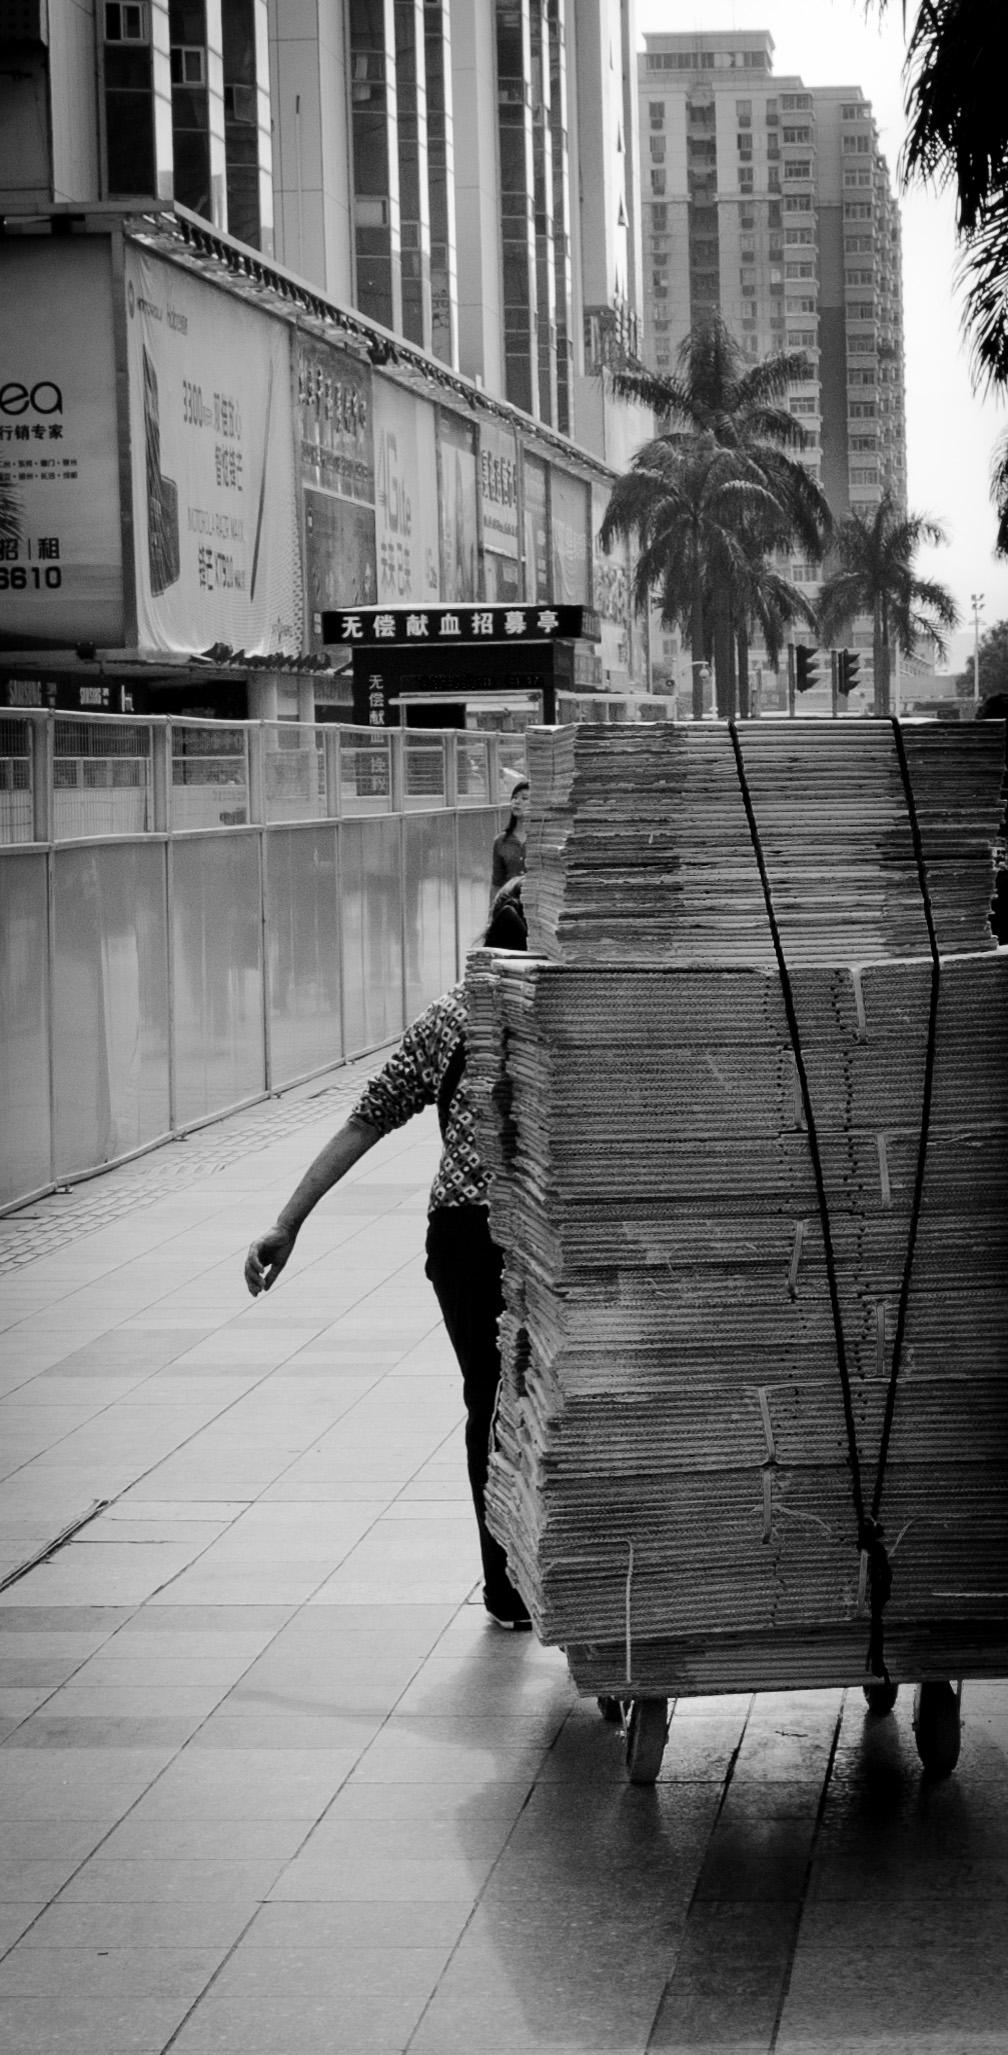 Cartons 2012 Shenzhen